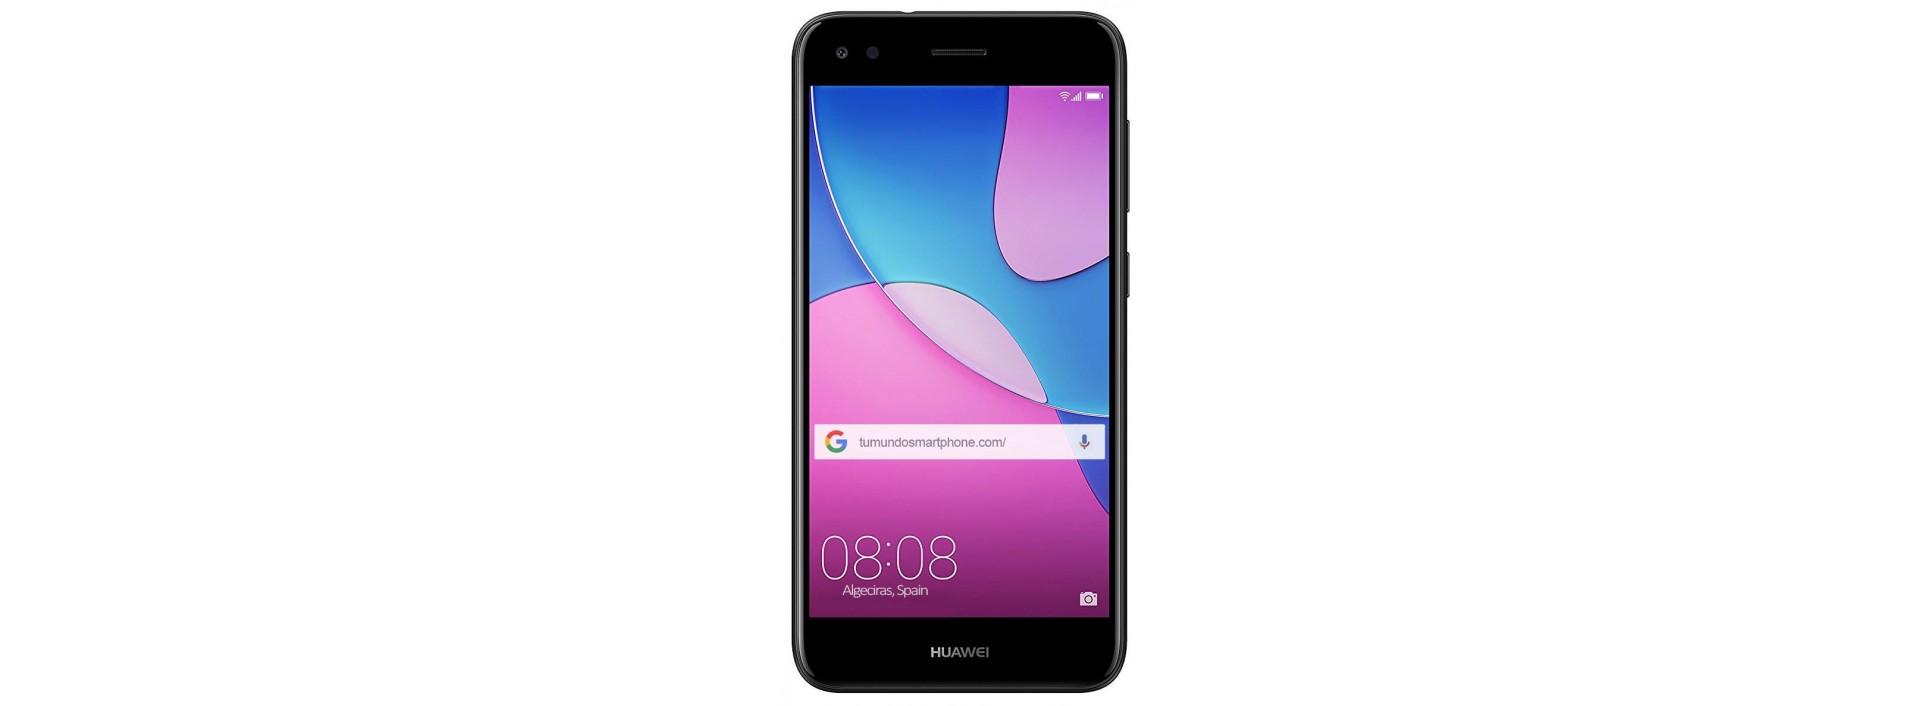 Fundas PERSONALIZADAS Huawei P9 Lite Mini, Envío Gratis en TMS